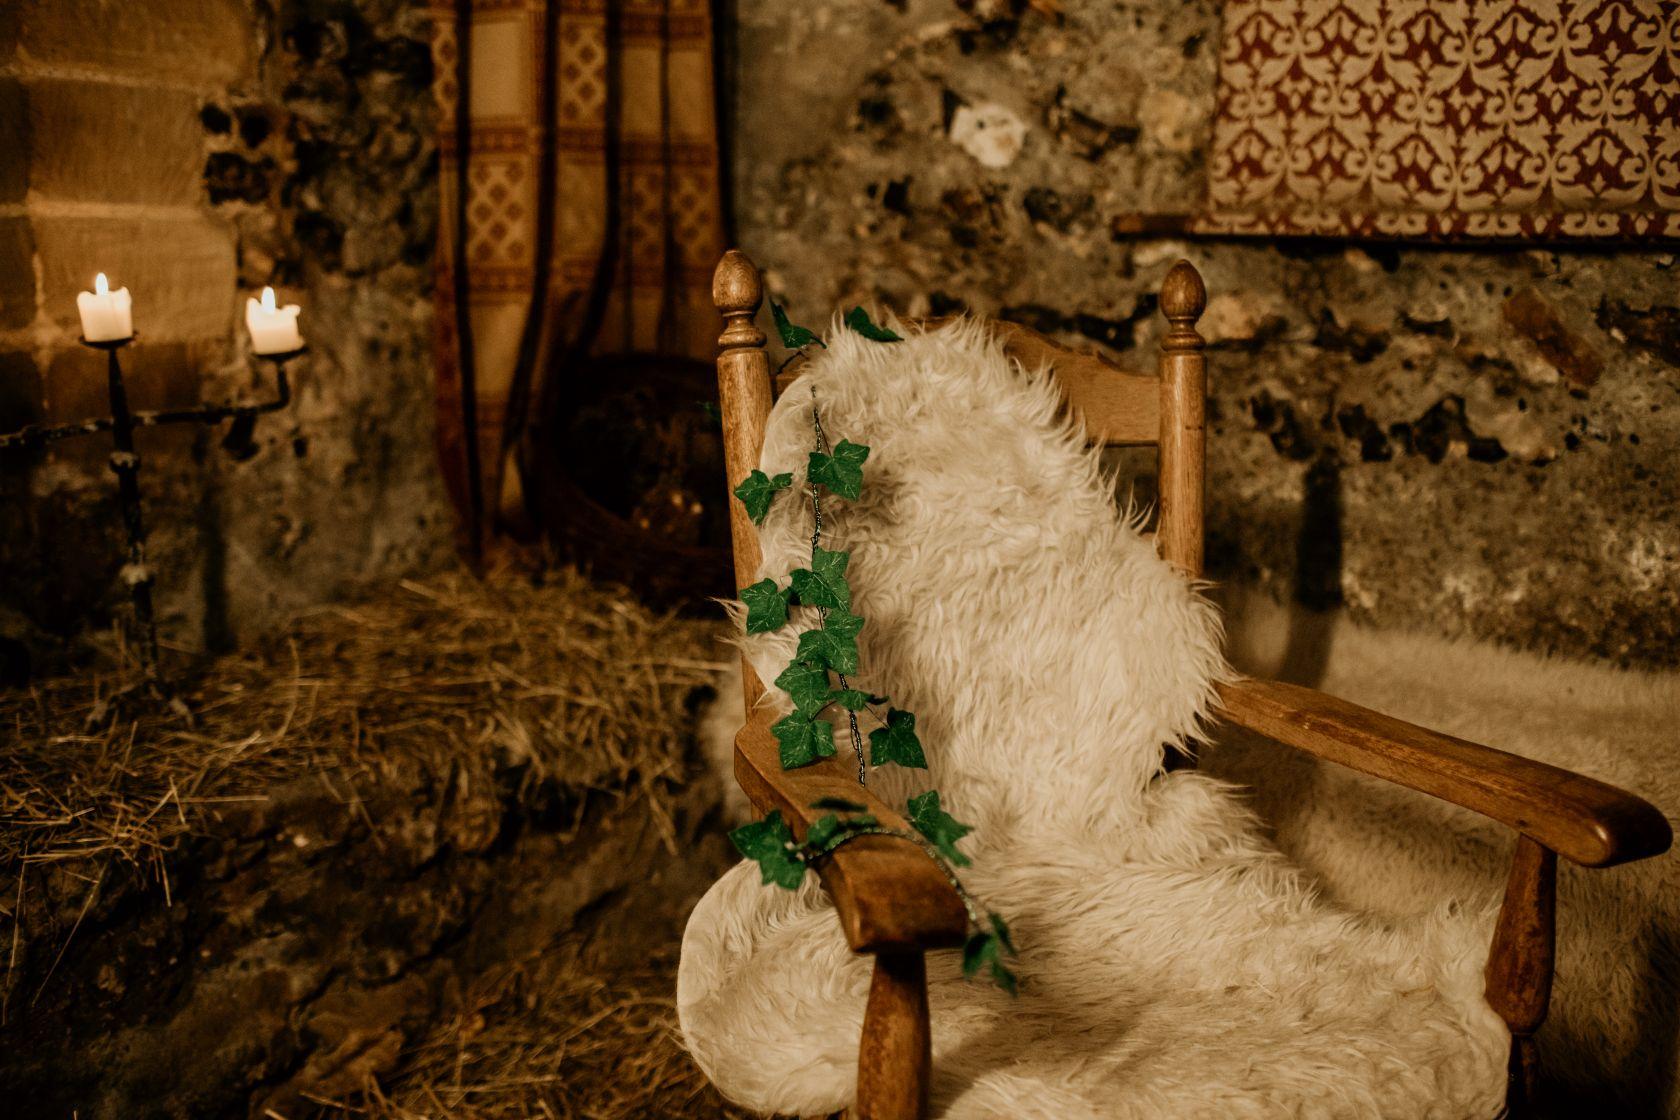 alternative fairytale wedding- snow white wedding- charlotte laurie designs-chloe mary photo- unconventional wedding- alternative wedding inspiration- alternative wedding styling